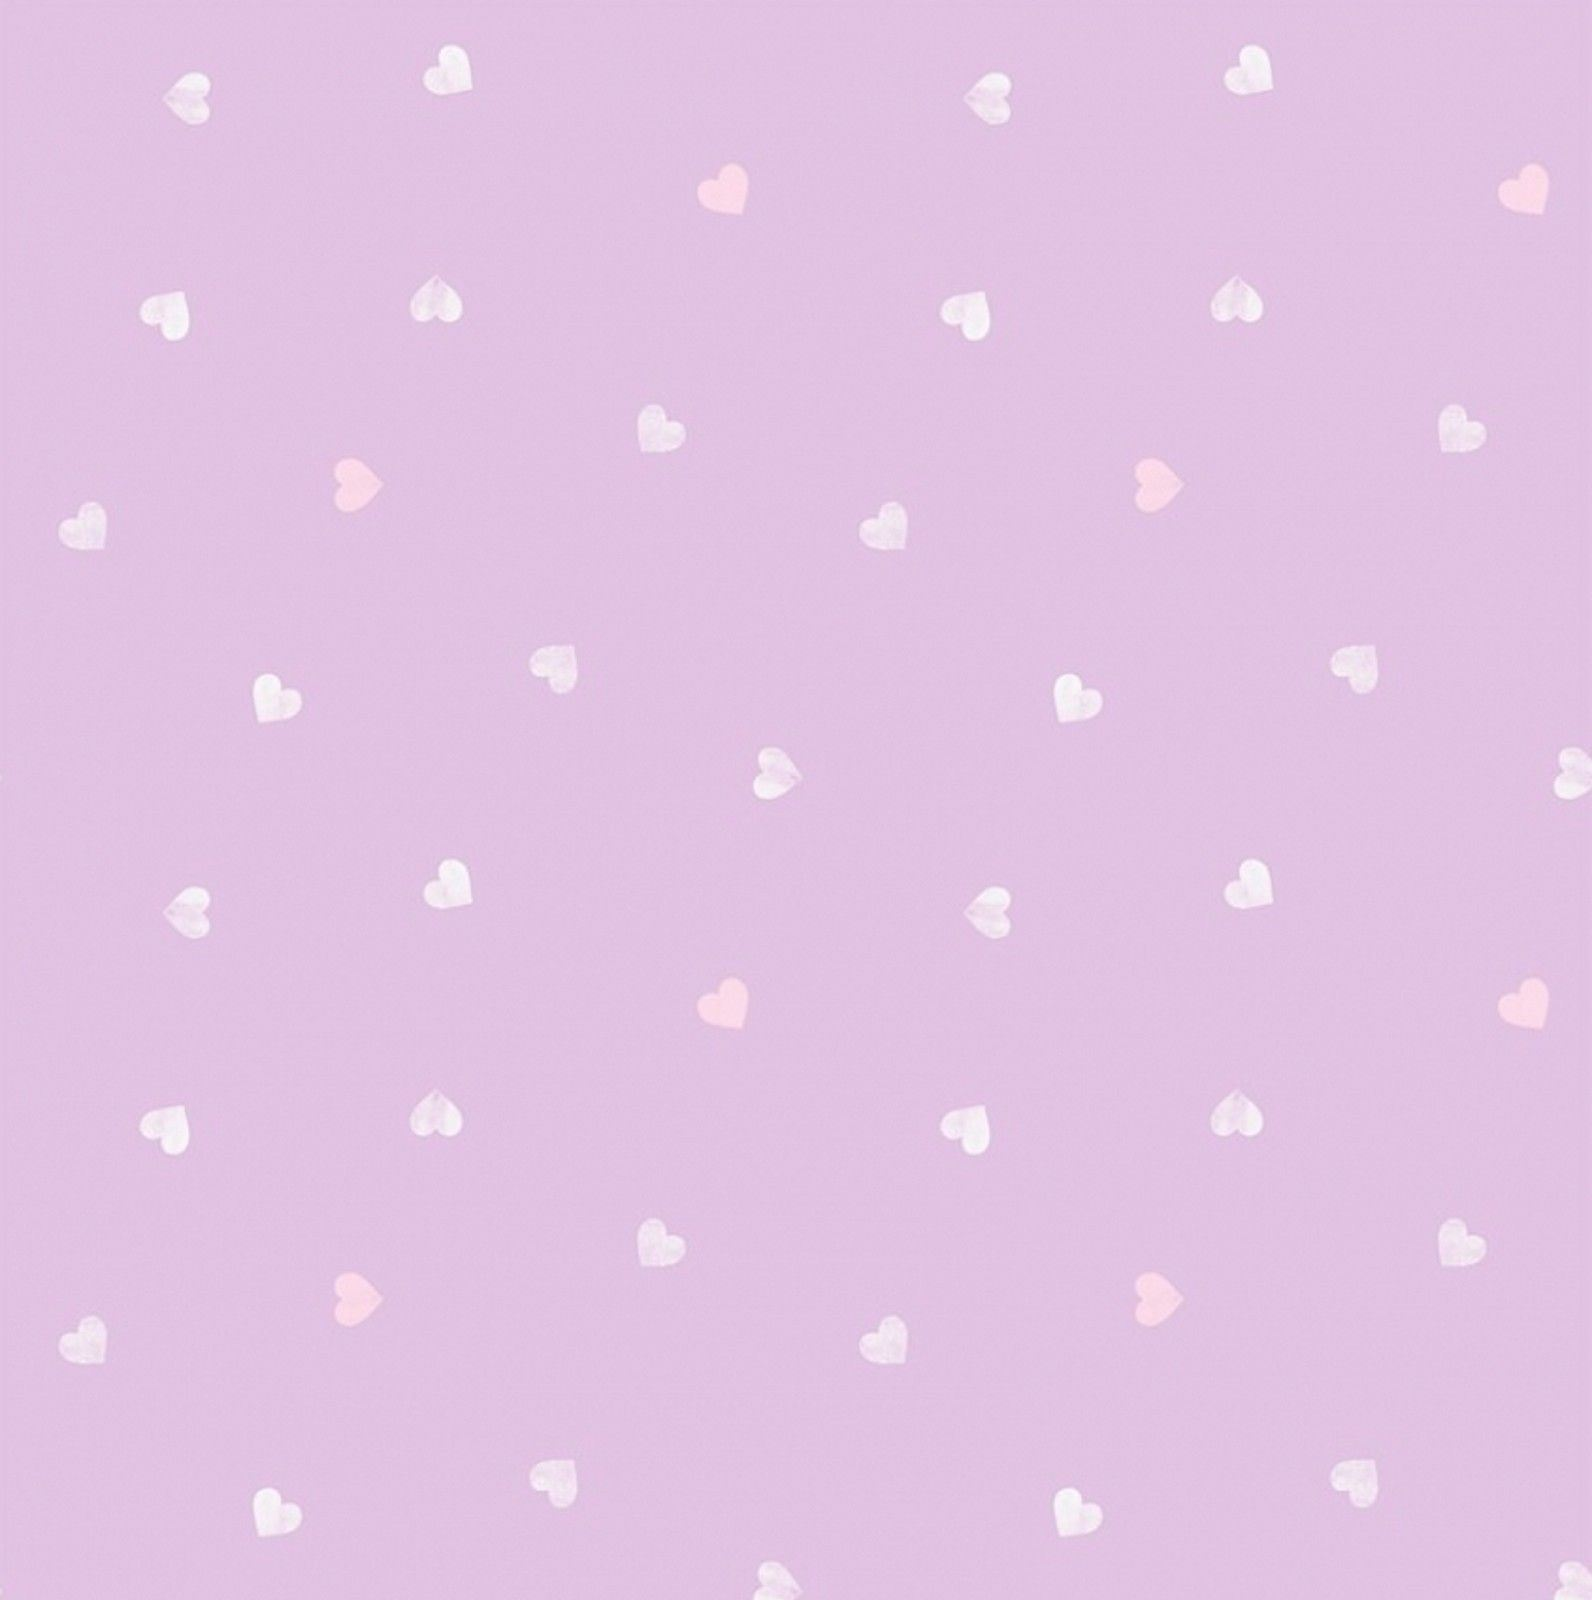 Pastel Lilac Purple Pearlescent Love Heart Girls Kids Nursery Baby